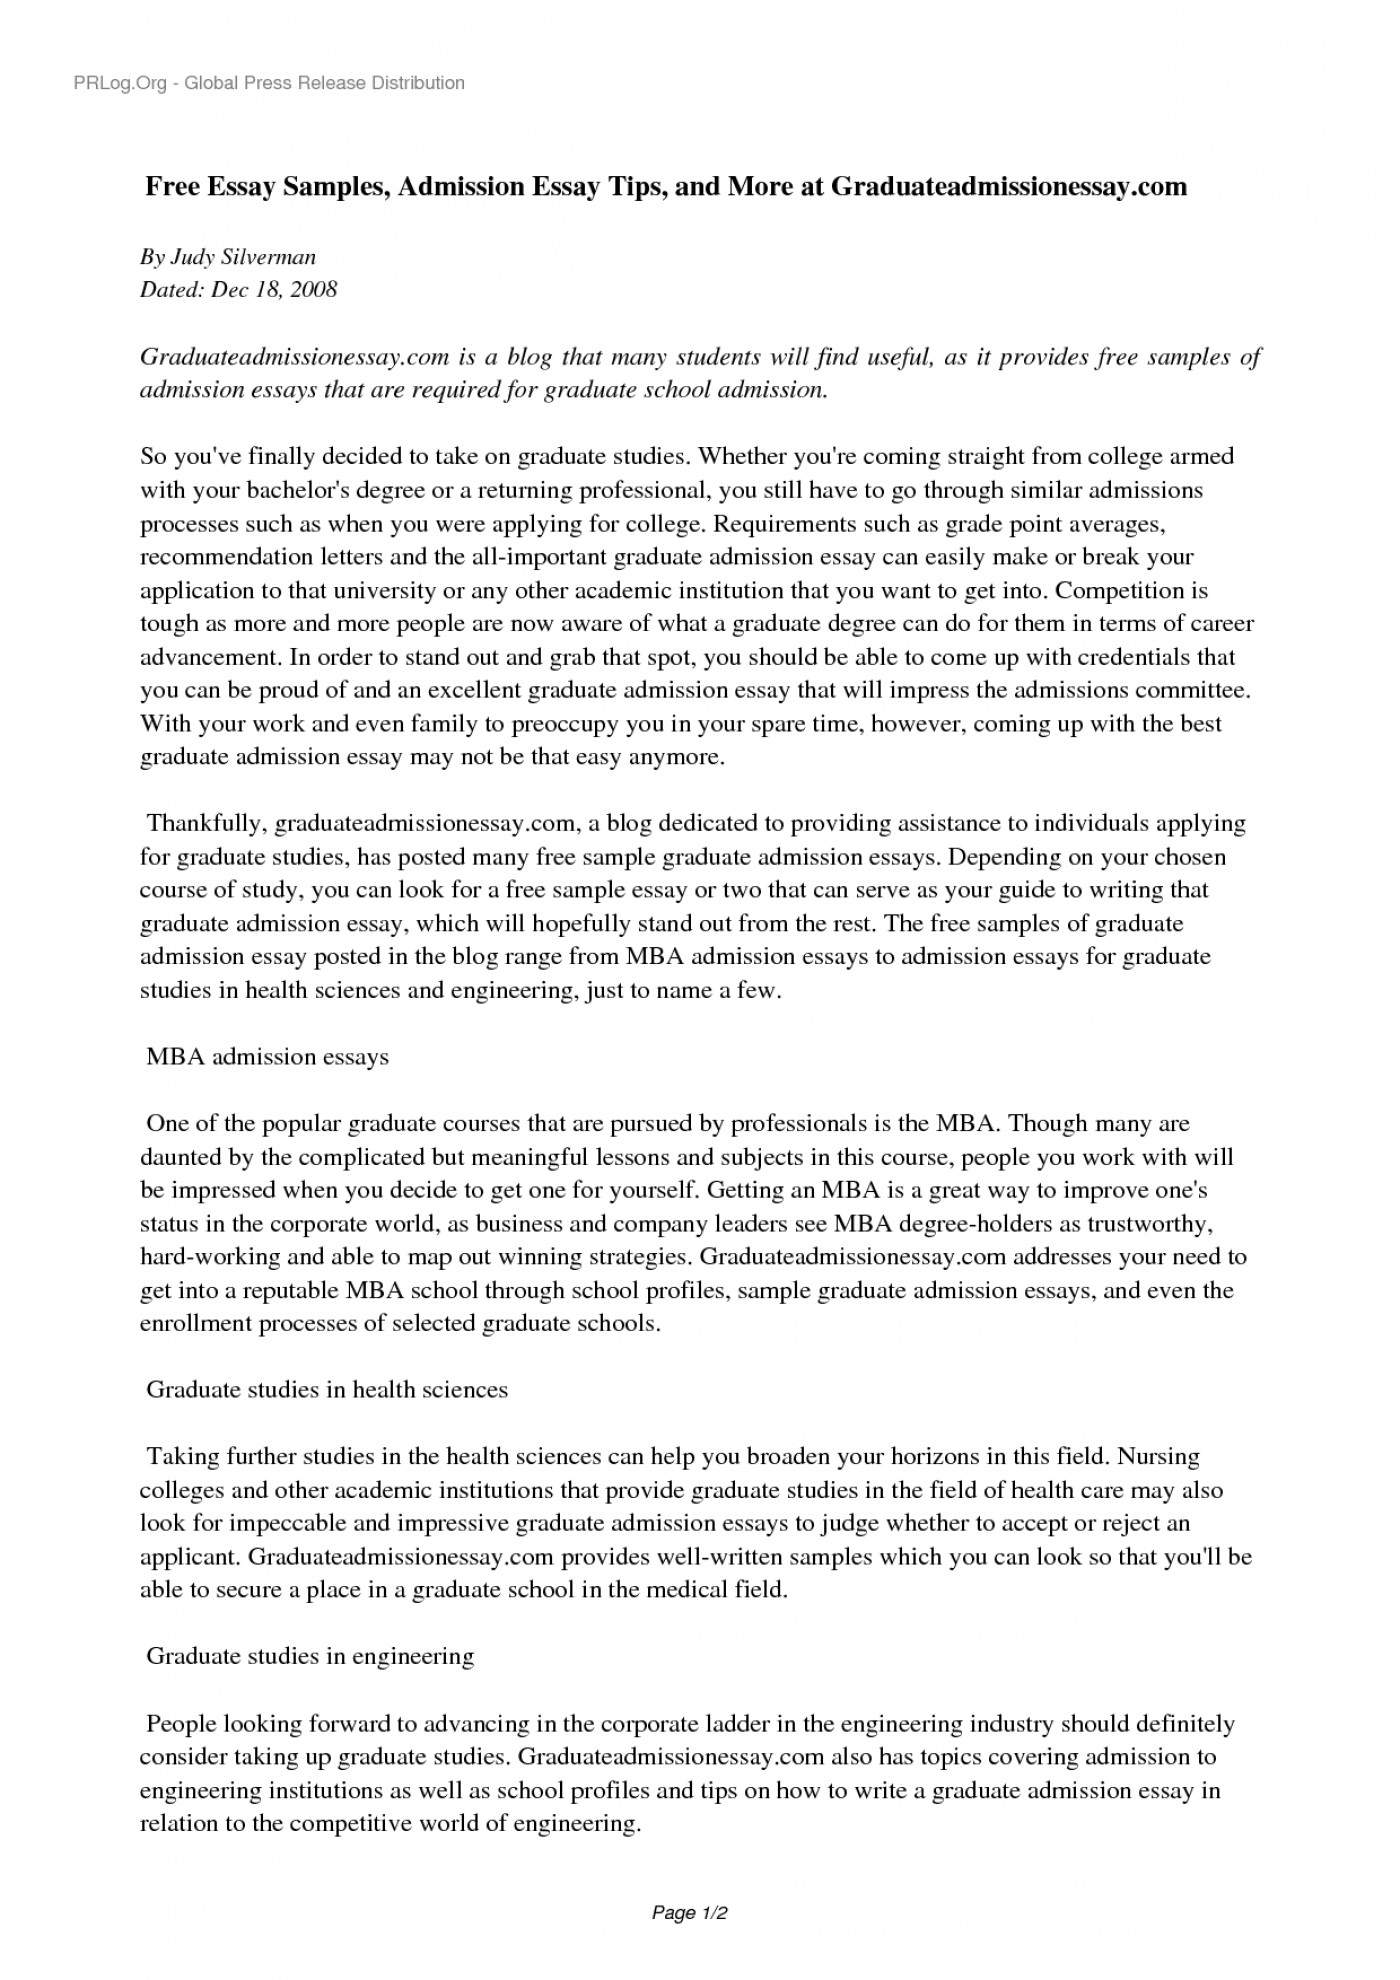 Essay for graduate school nursing